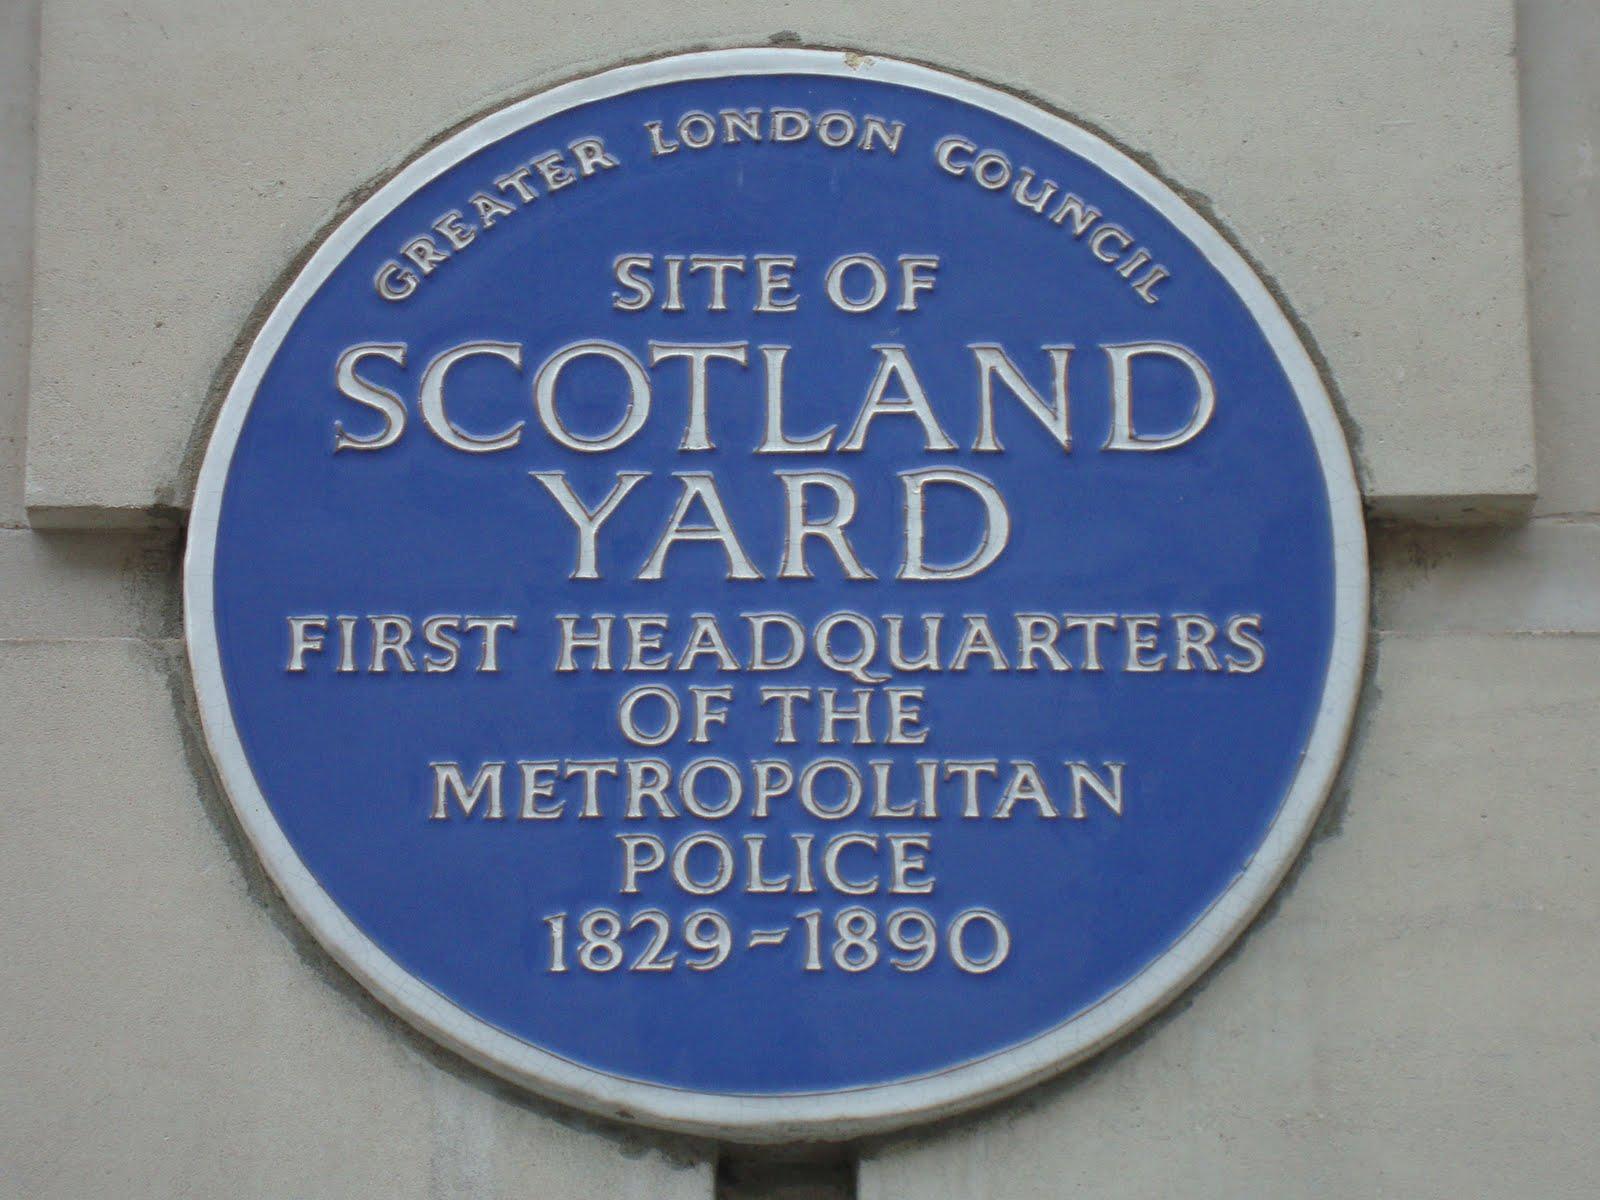 http://3.bp.blogspot.com/_6FJ85aEm-pU/TGDz4GcwNpI/AAAAAAAACFk/AbyJ1A7AulQ/s1600/London+Walks+Scotland+Yard.JPG